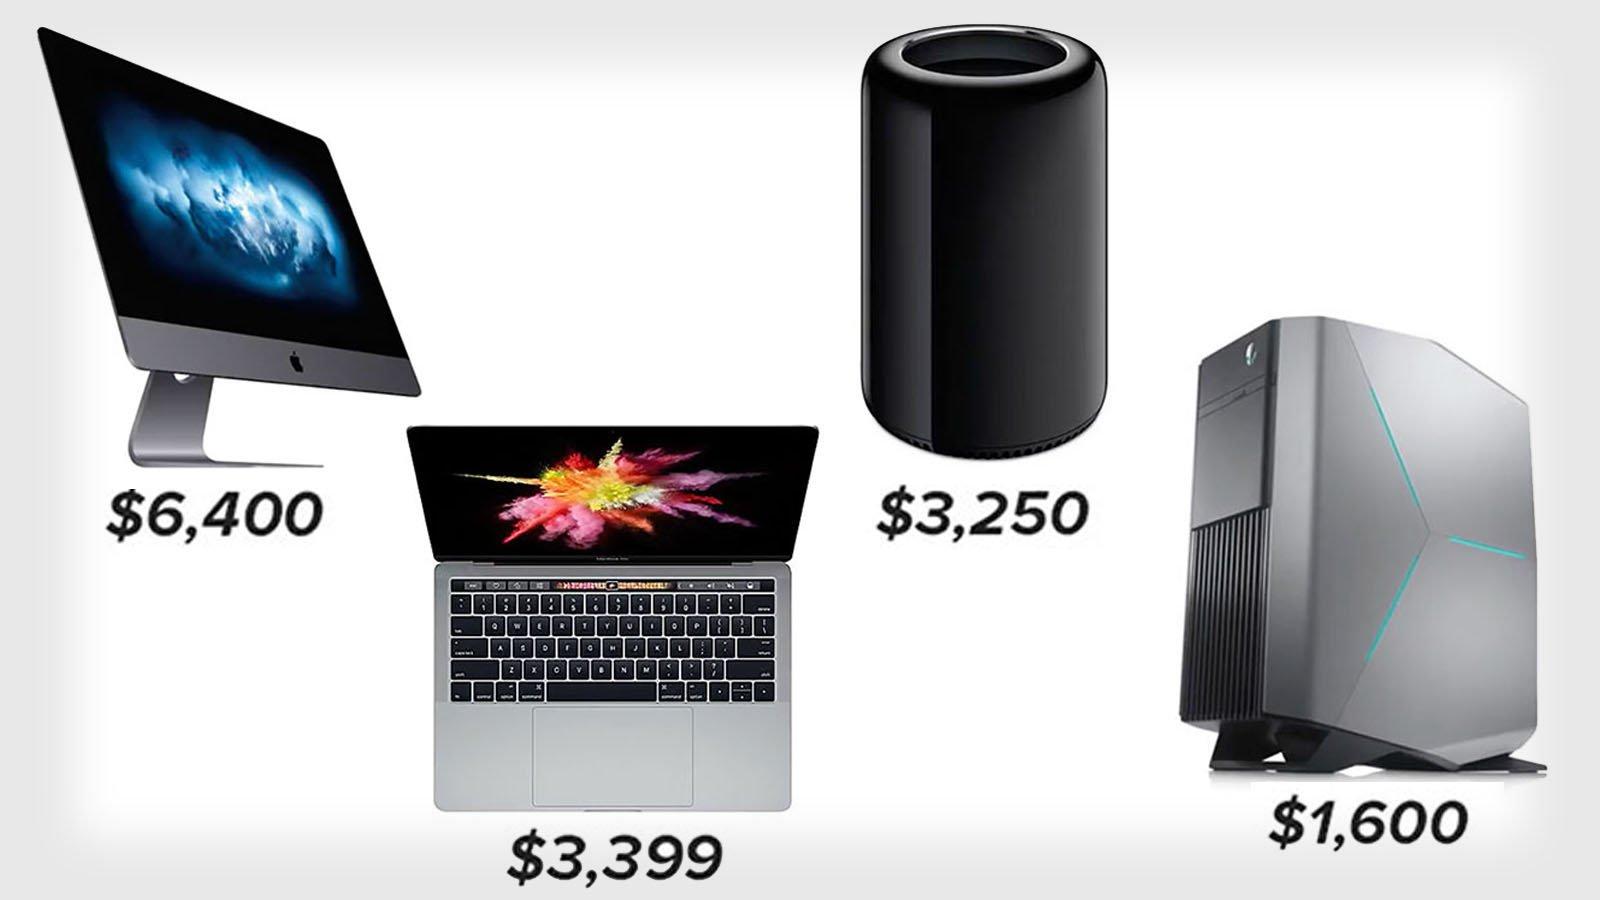 Photoshop Speed Test: Gaming PC vs  iMac Pro, Mac Pro, and